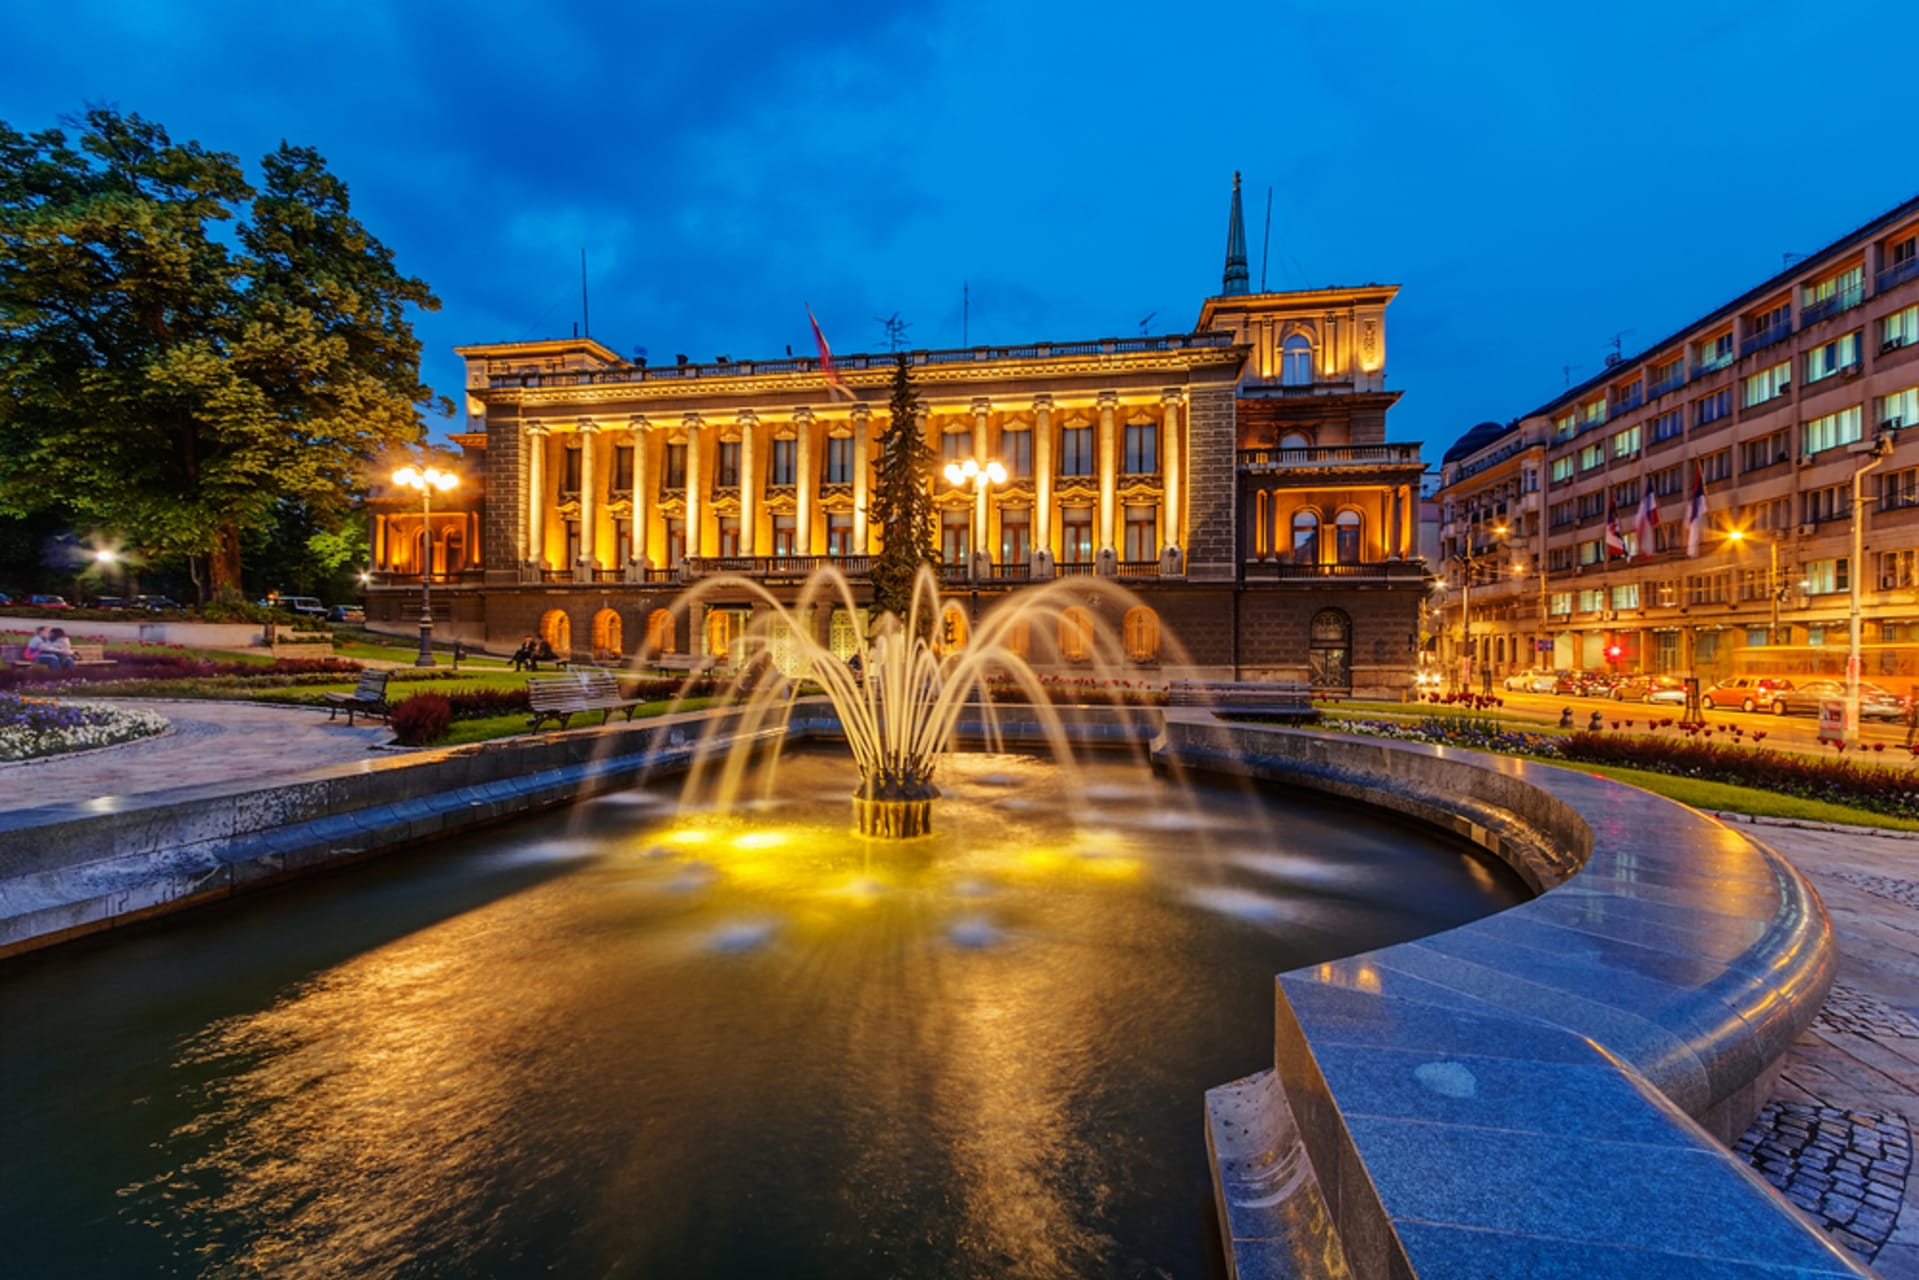 Belgrade - Evening Walk Through the Center of Belgrade - a Fusion of Light and Vibrant Atmosphere